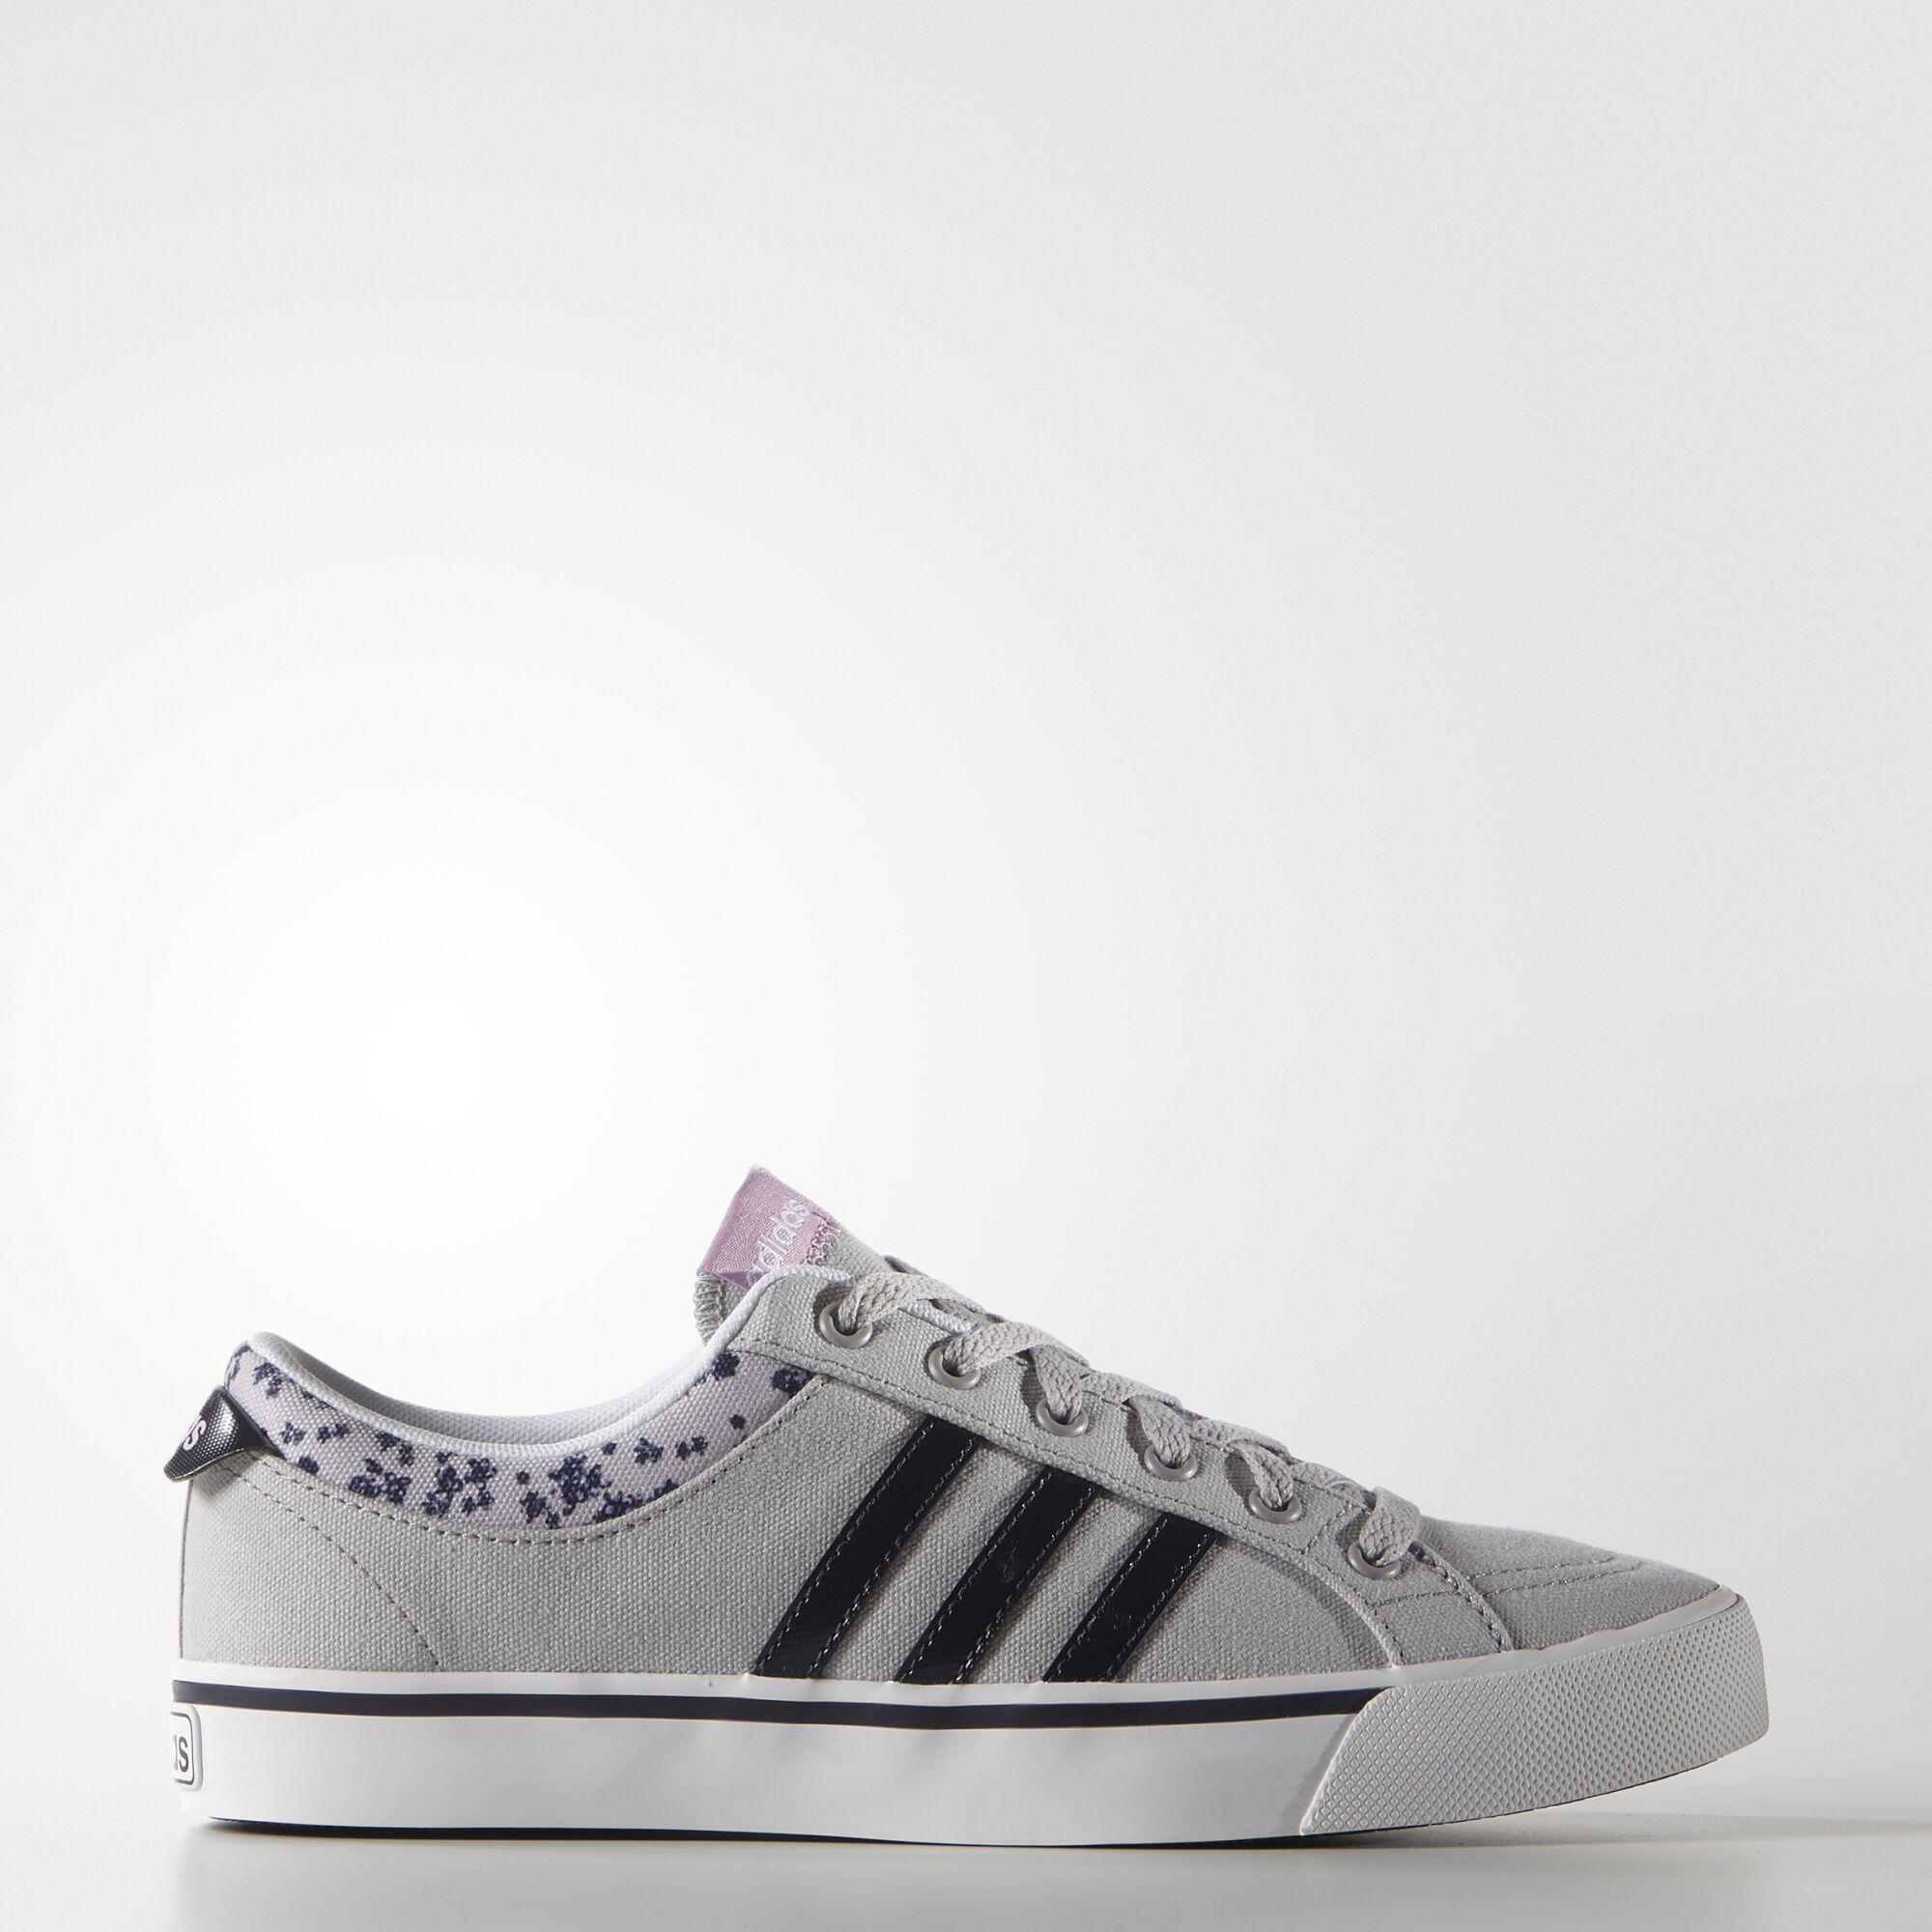 zapatillas adidas piona w mujer linea neo 2013